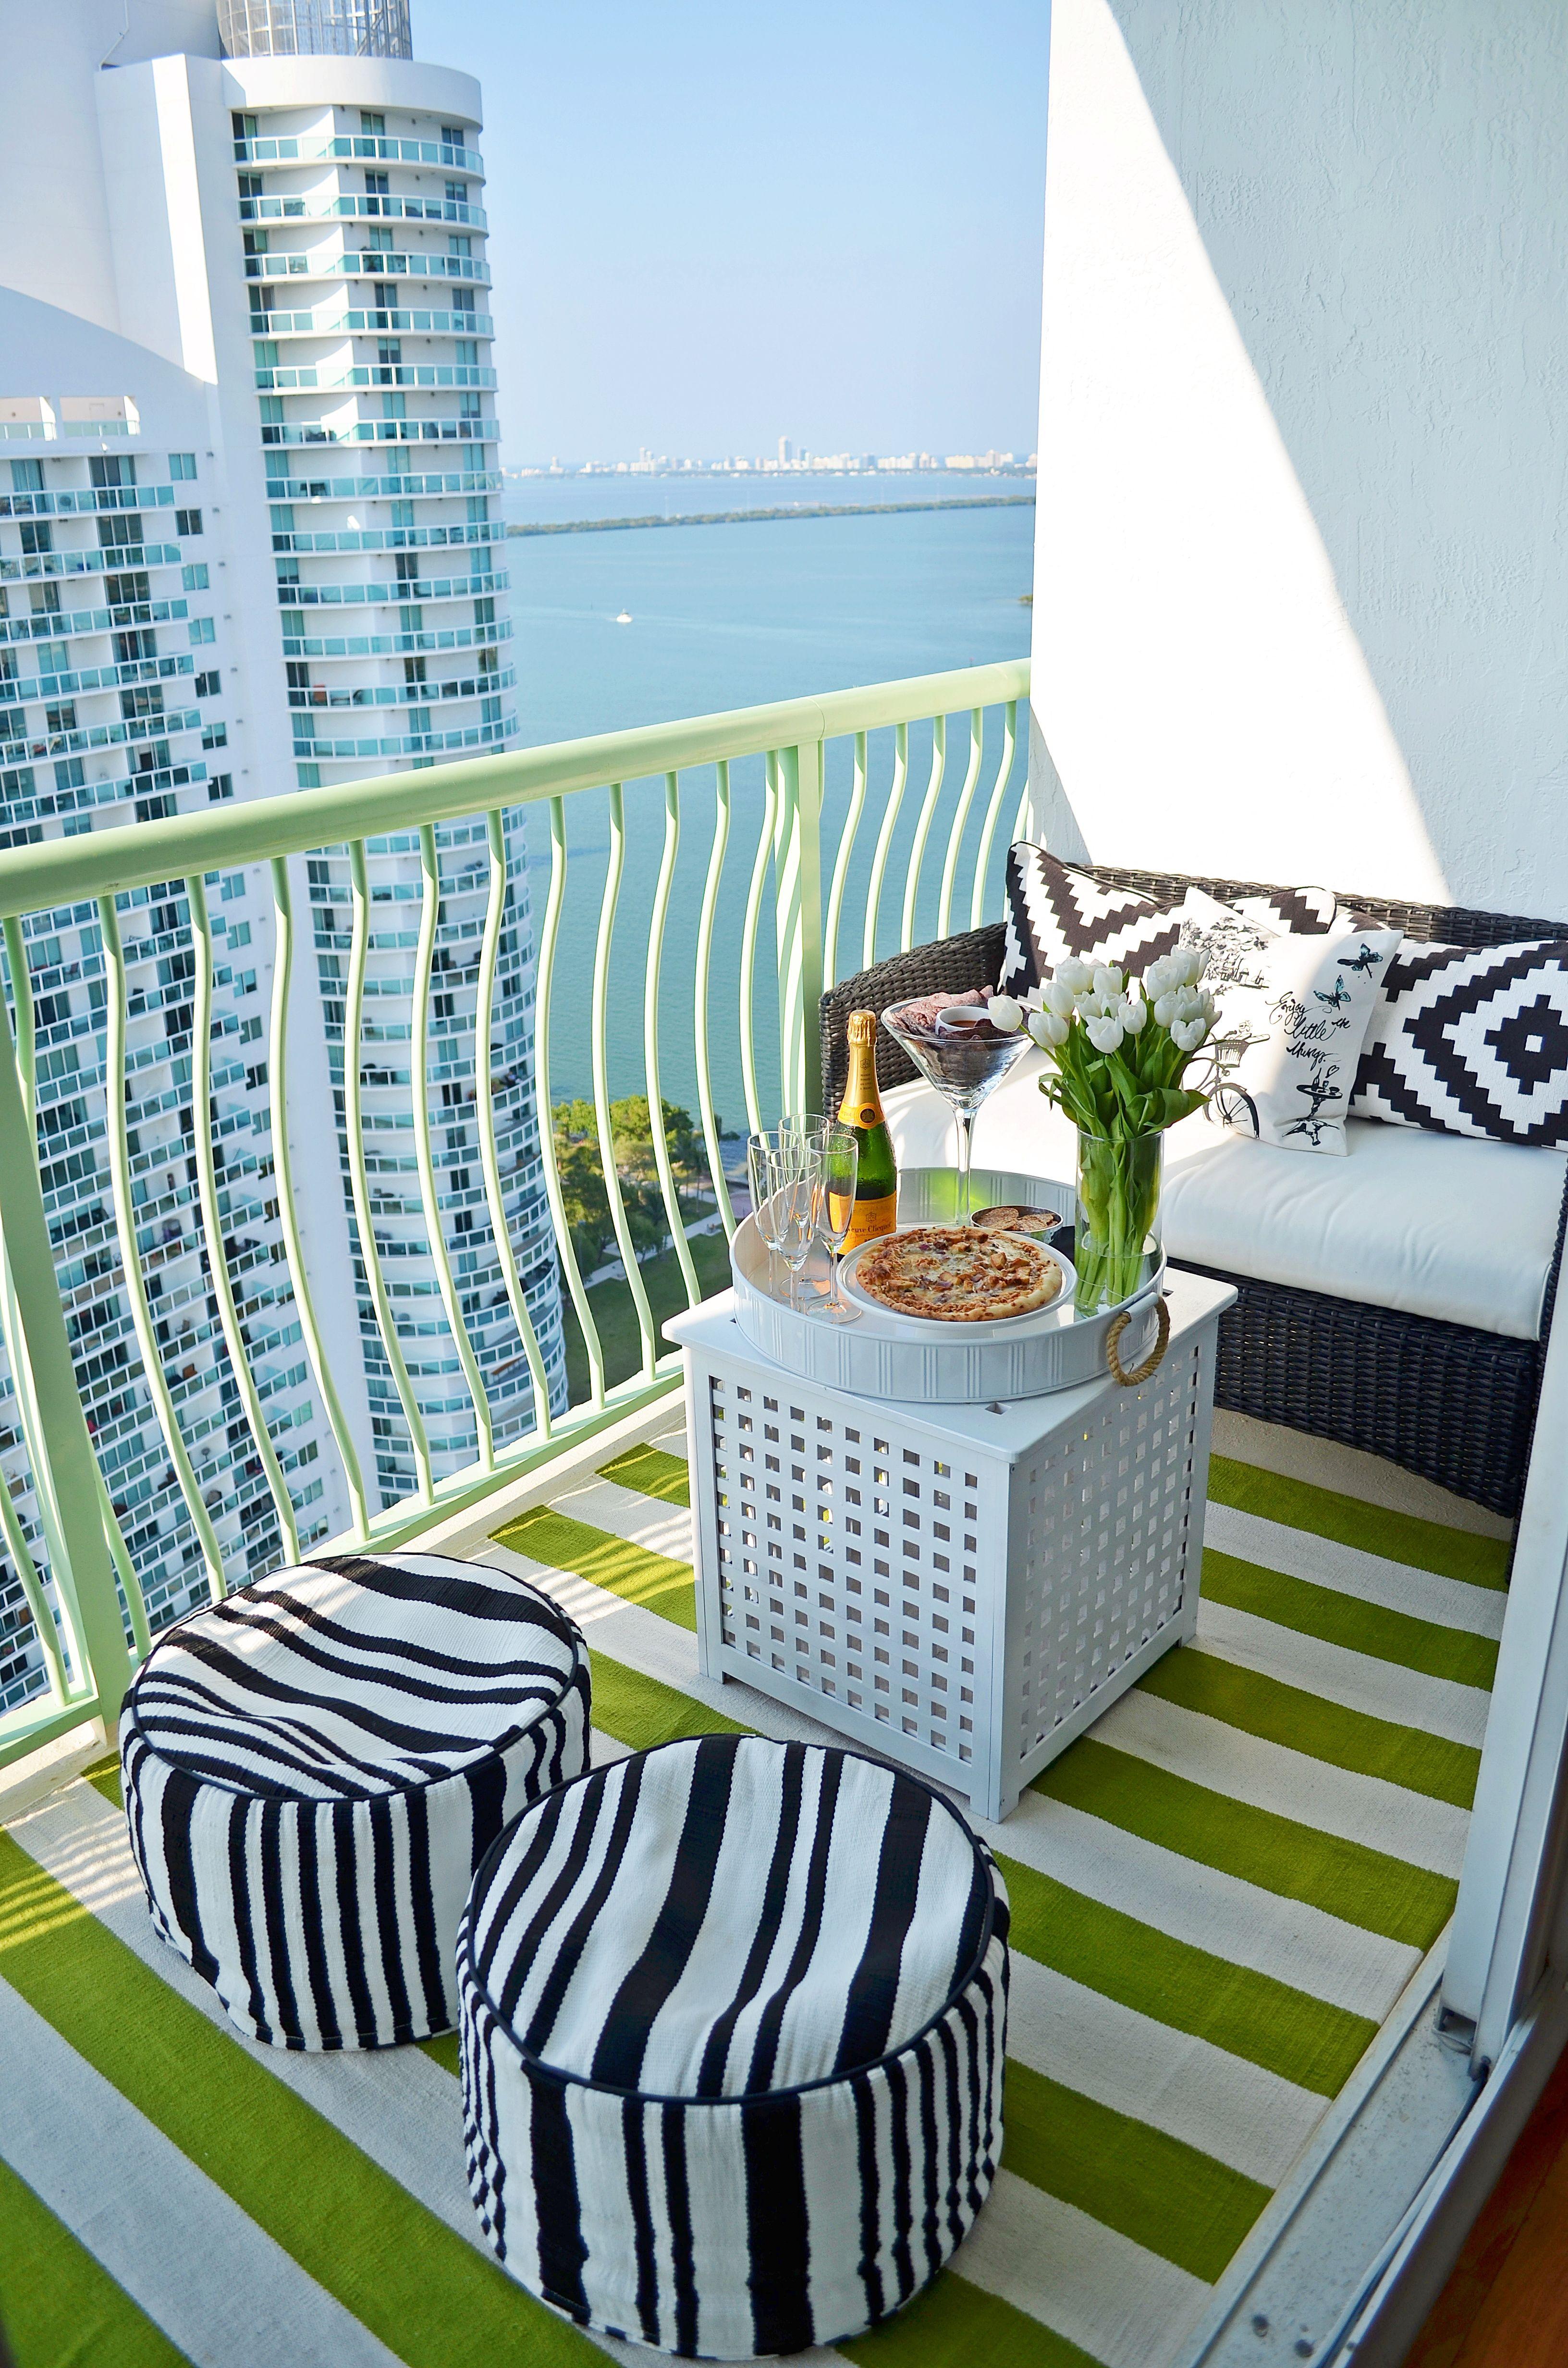 outdoor living mod max glam small balcony furniture balcony furniture cozy apartment decor